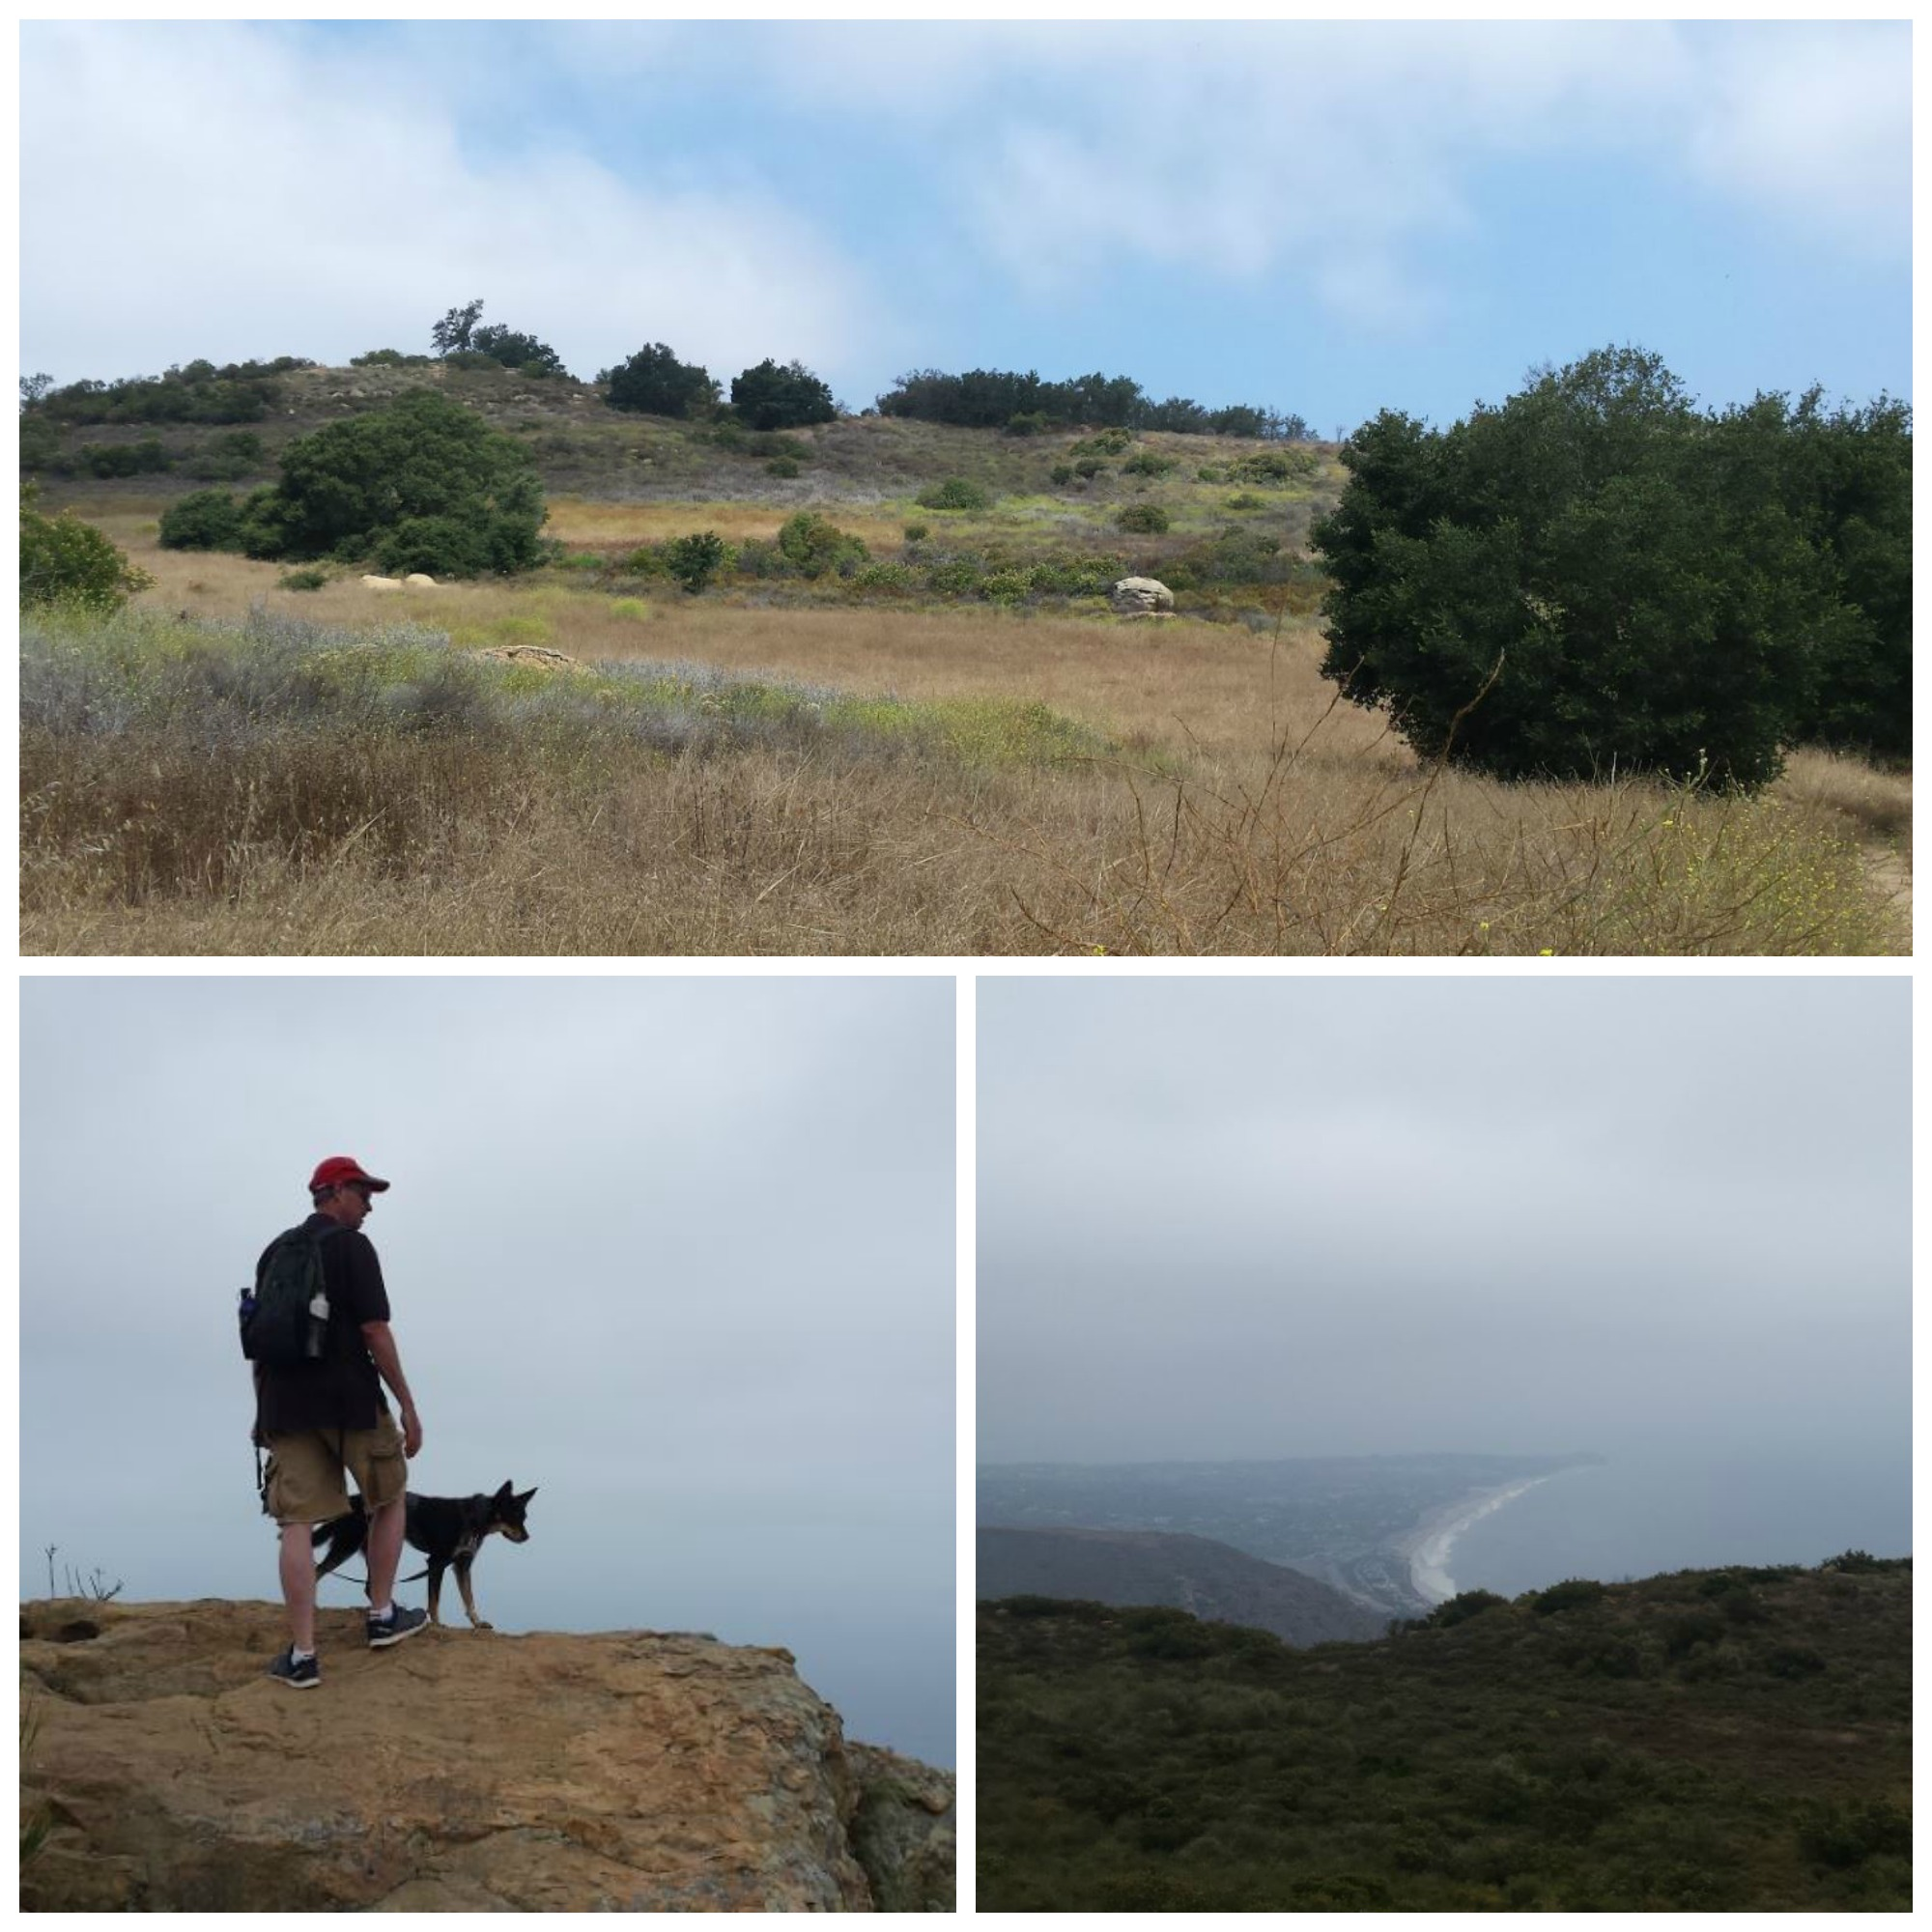 Malibu hike Charmlee Wilderness Park